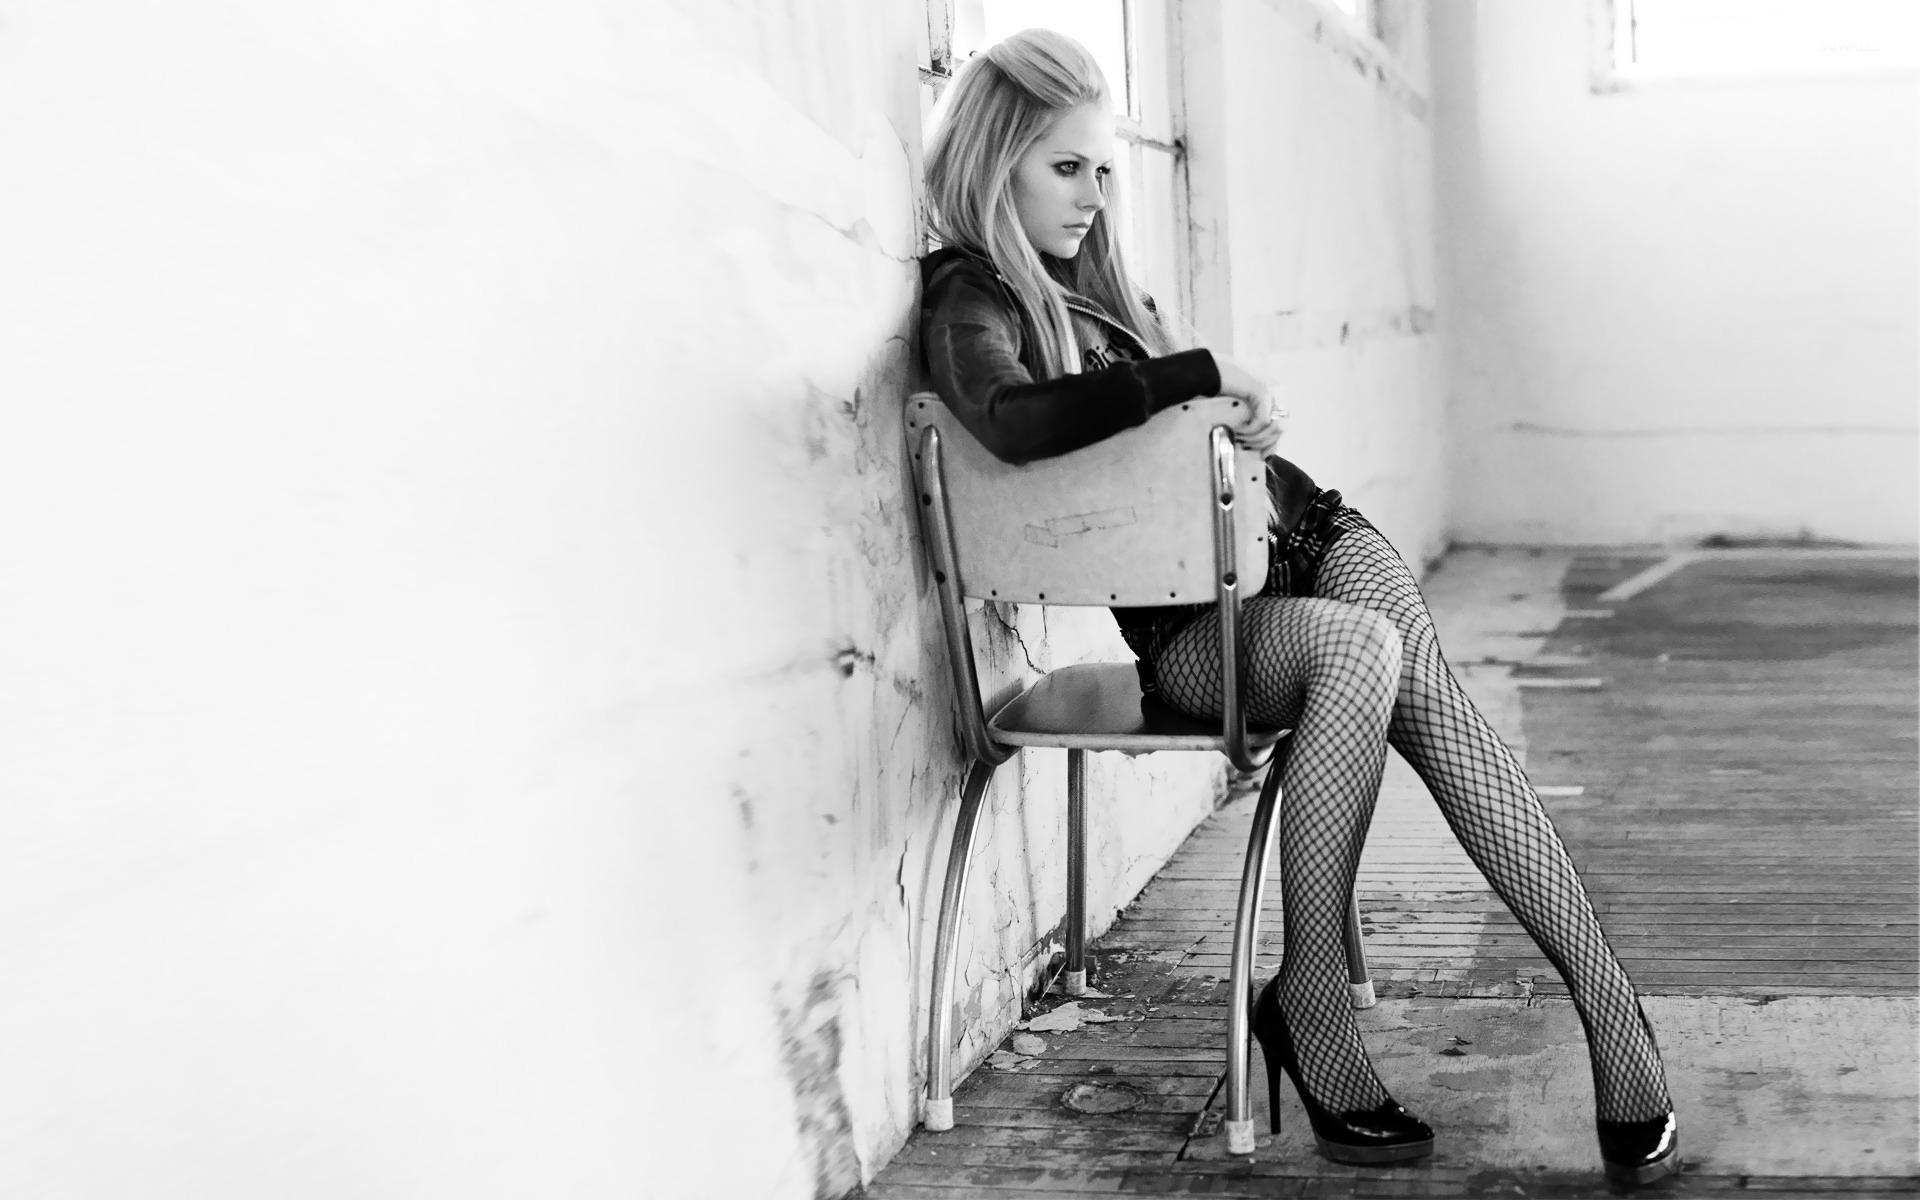 Avril Lavigne 18 Wallpaper Celebrity Wallpapers 12521